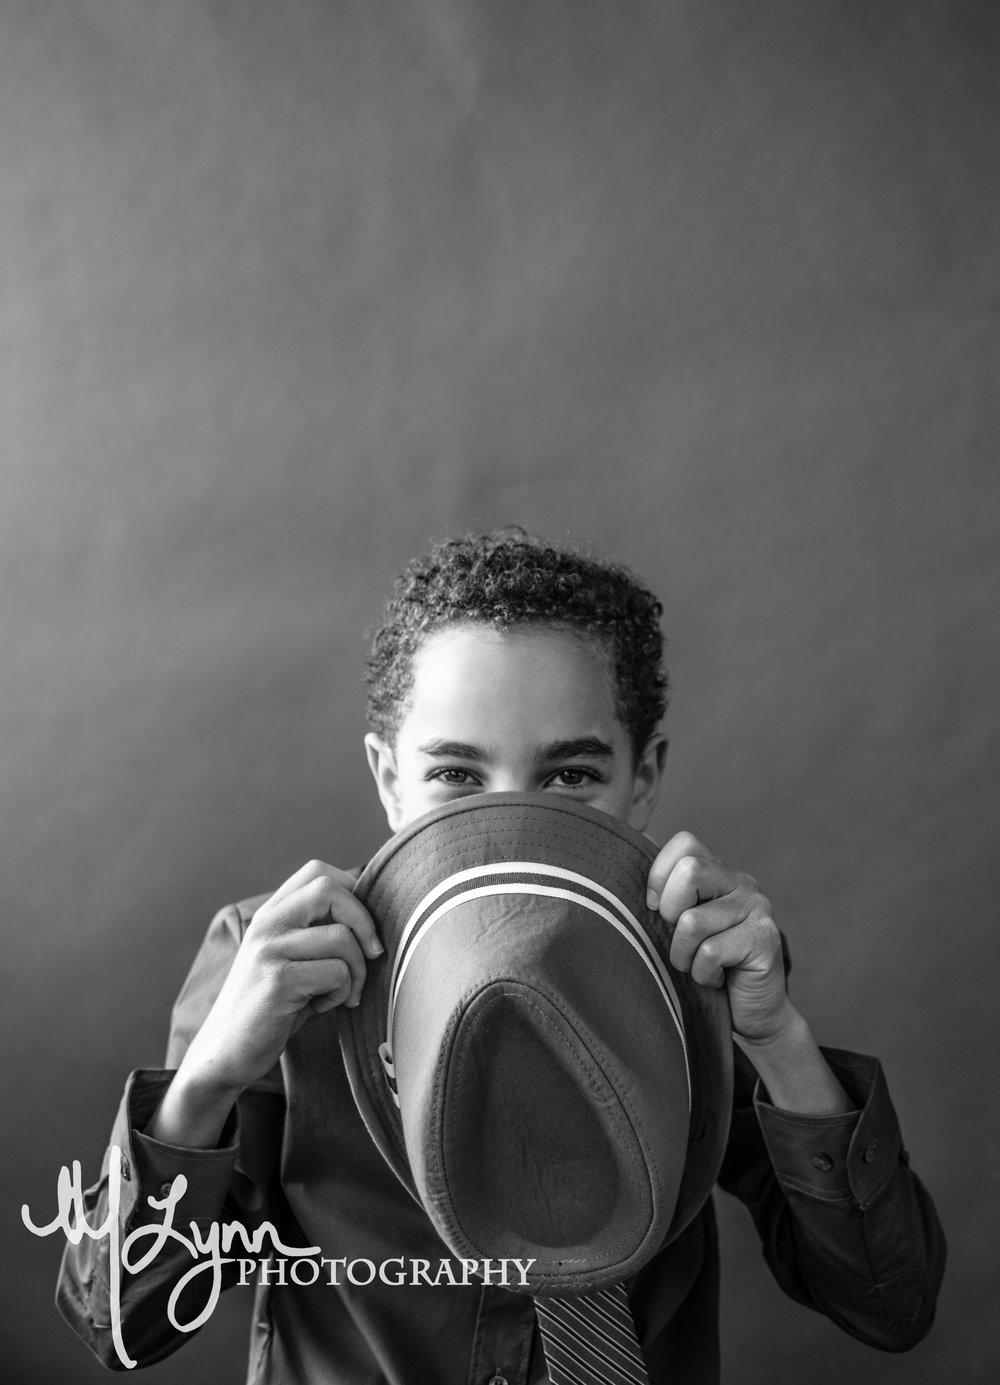 fine art boy child portrait peek a boo black and white.jpg